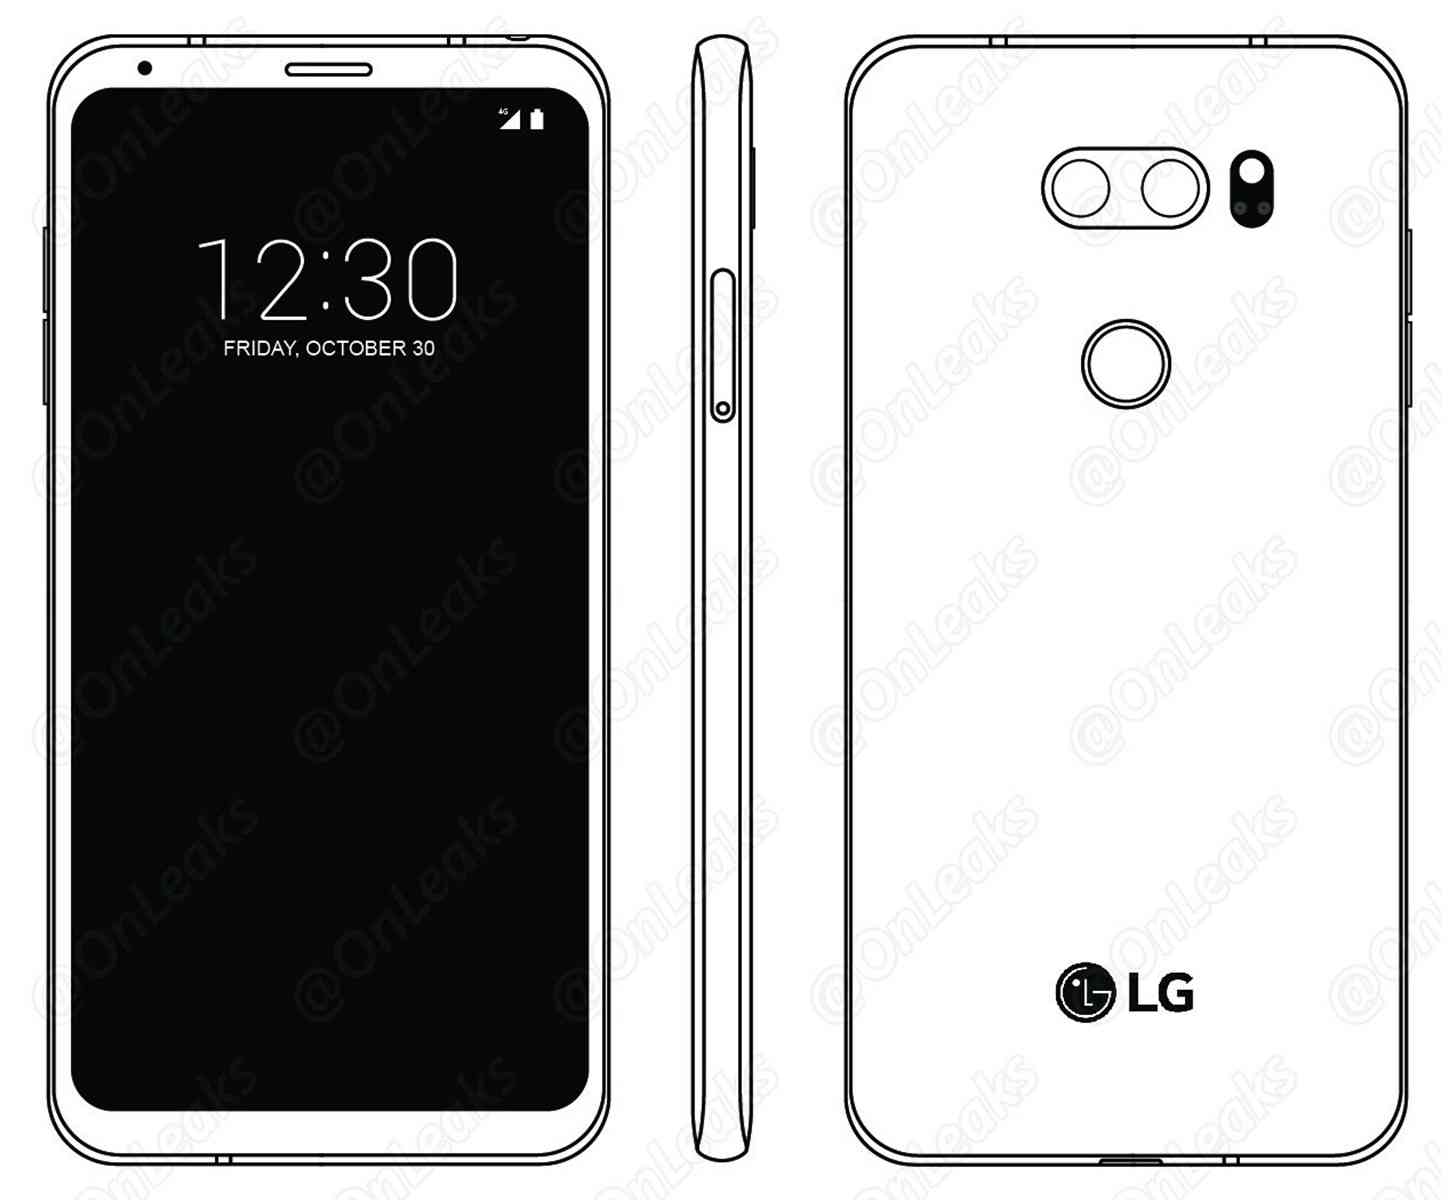 LG V30 image leak